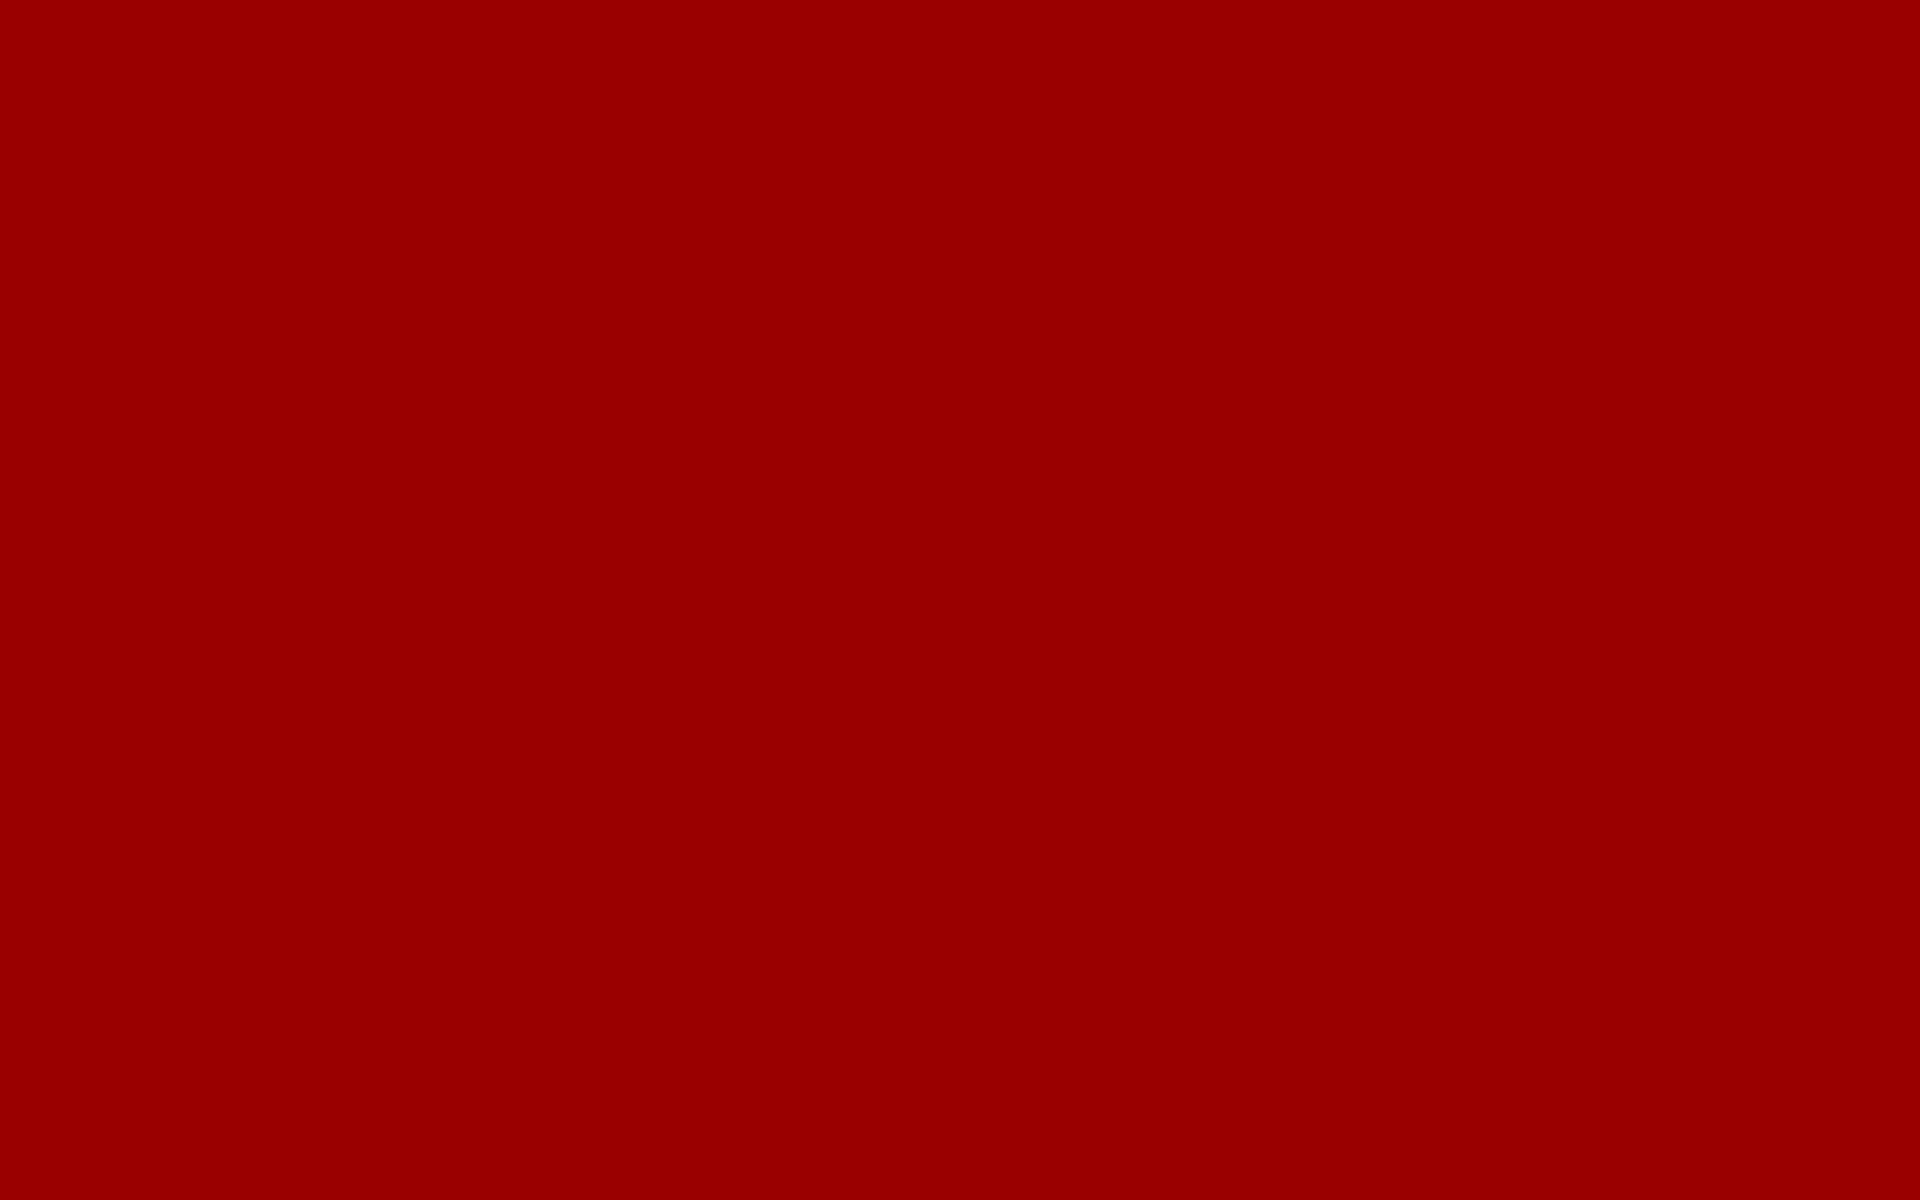 1920x1200 Stizza Solid Color Background